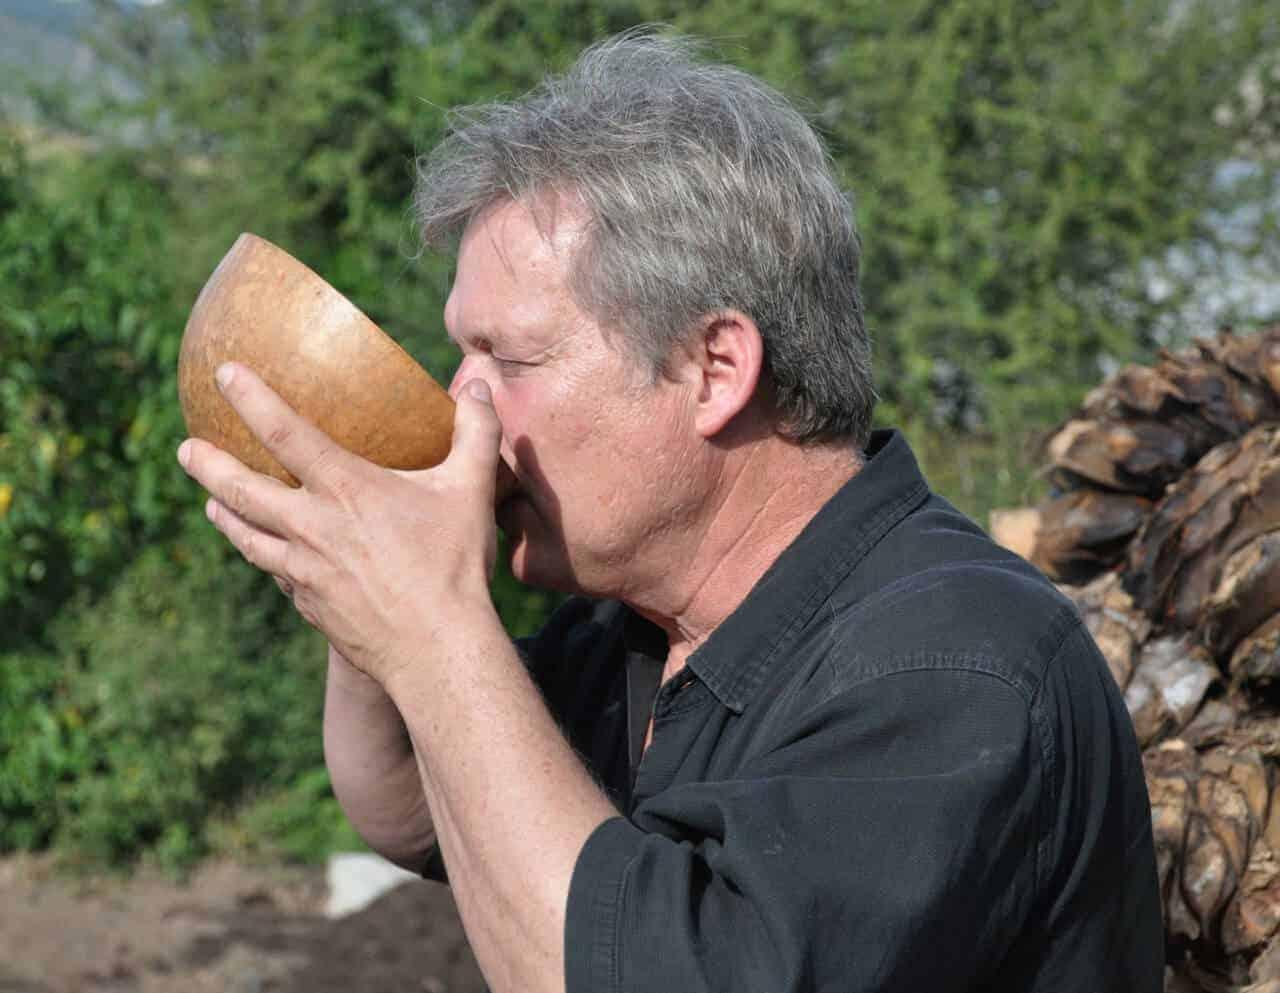 Sampling mezcal in a gourd in Oaxaca Mexico